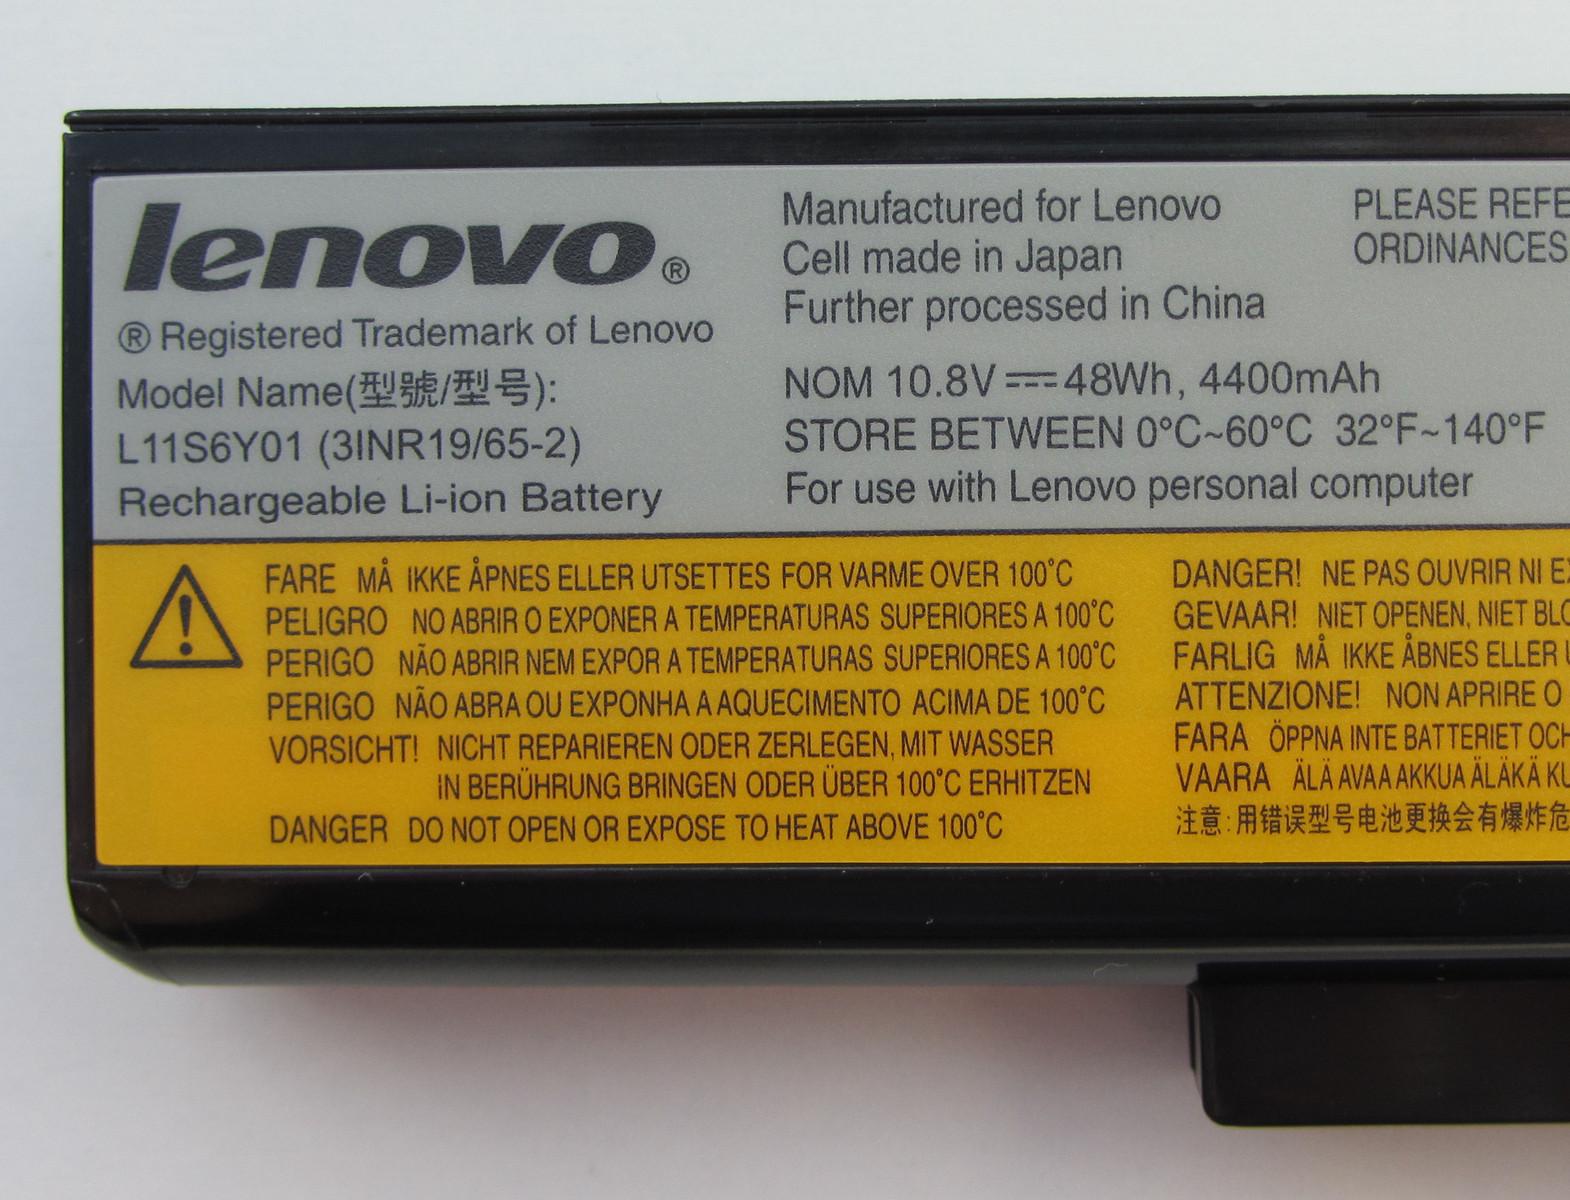 how to take screenshot in lenovo g580 laptop